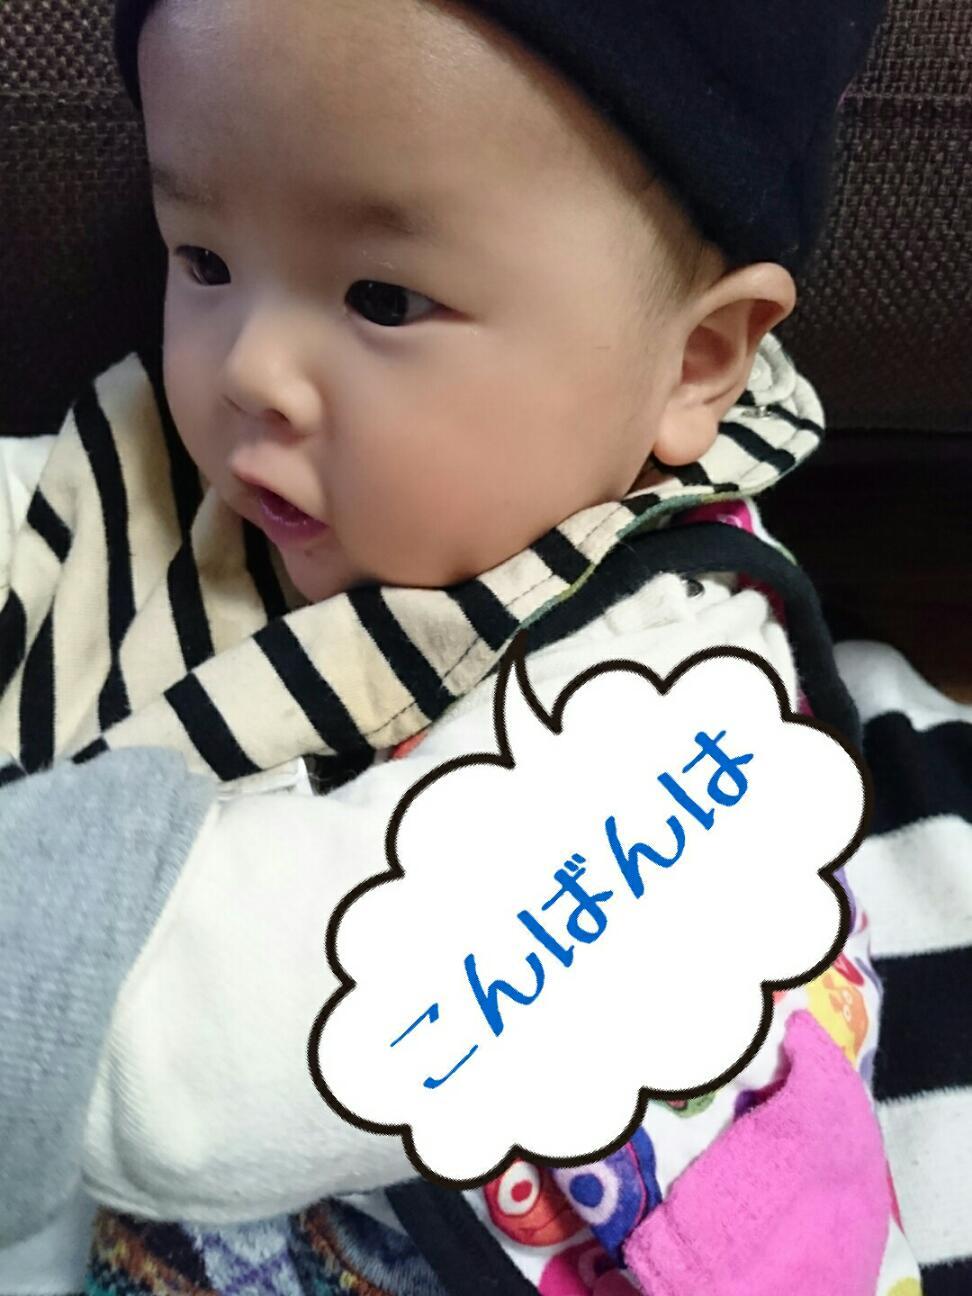 rakugaki_20151220181002841_zed20151220_181132_90p.jpg